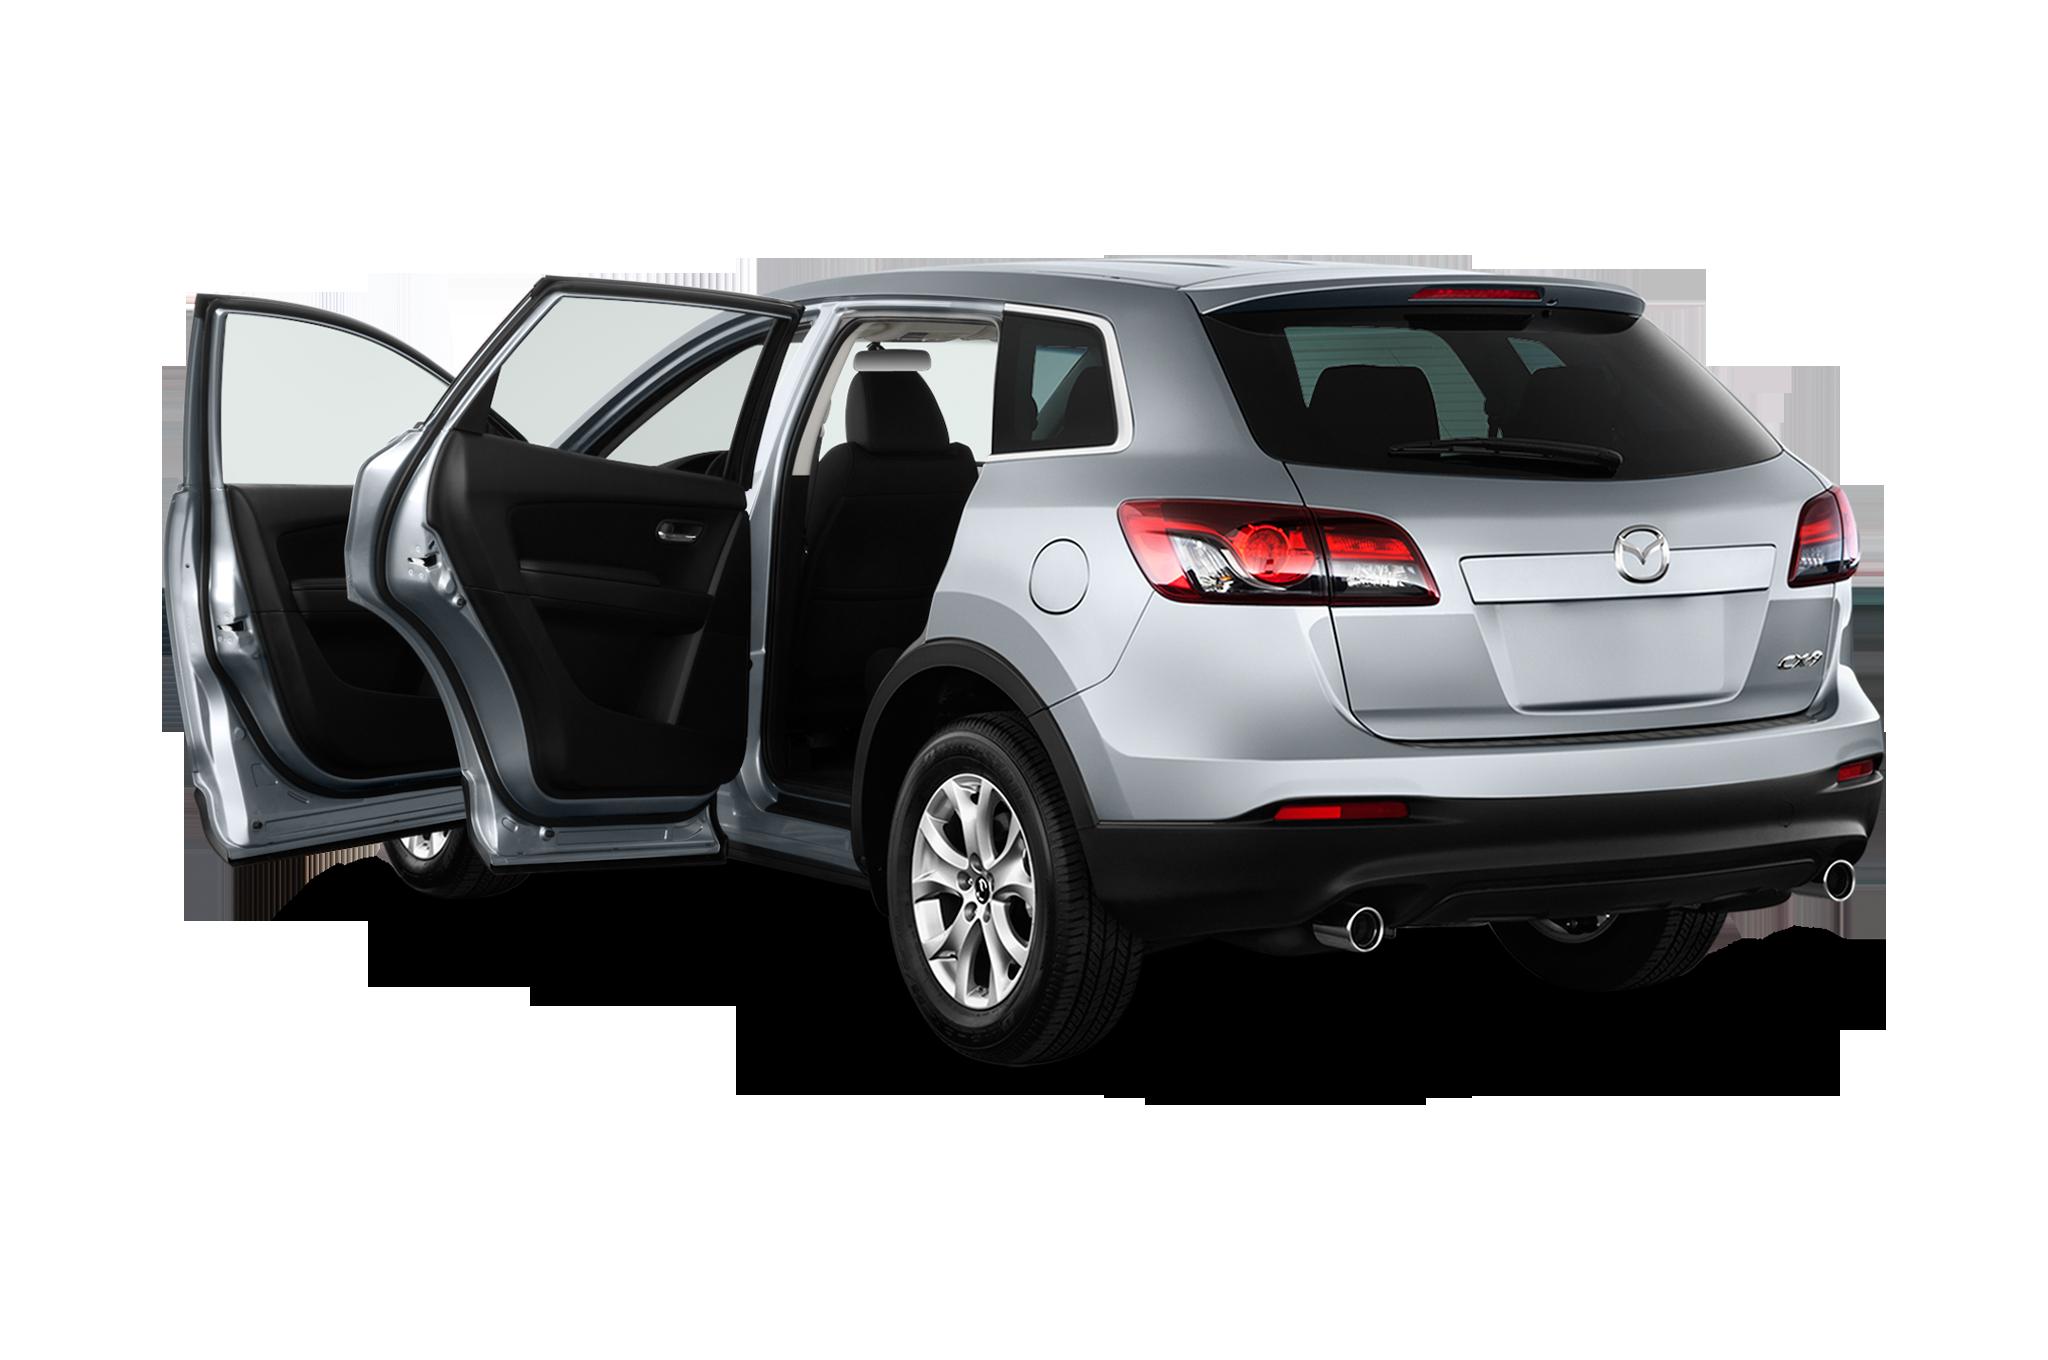 Mazda Cx9 Or Nissan Rogue Autos Post